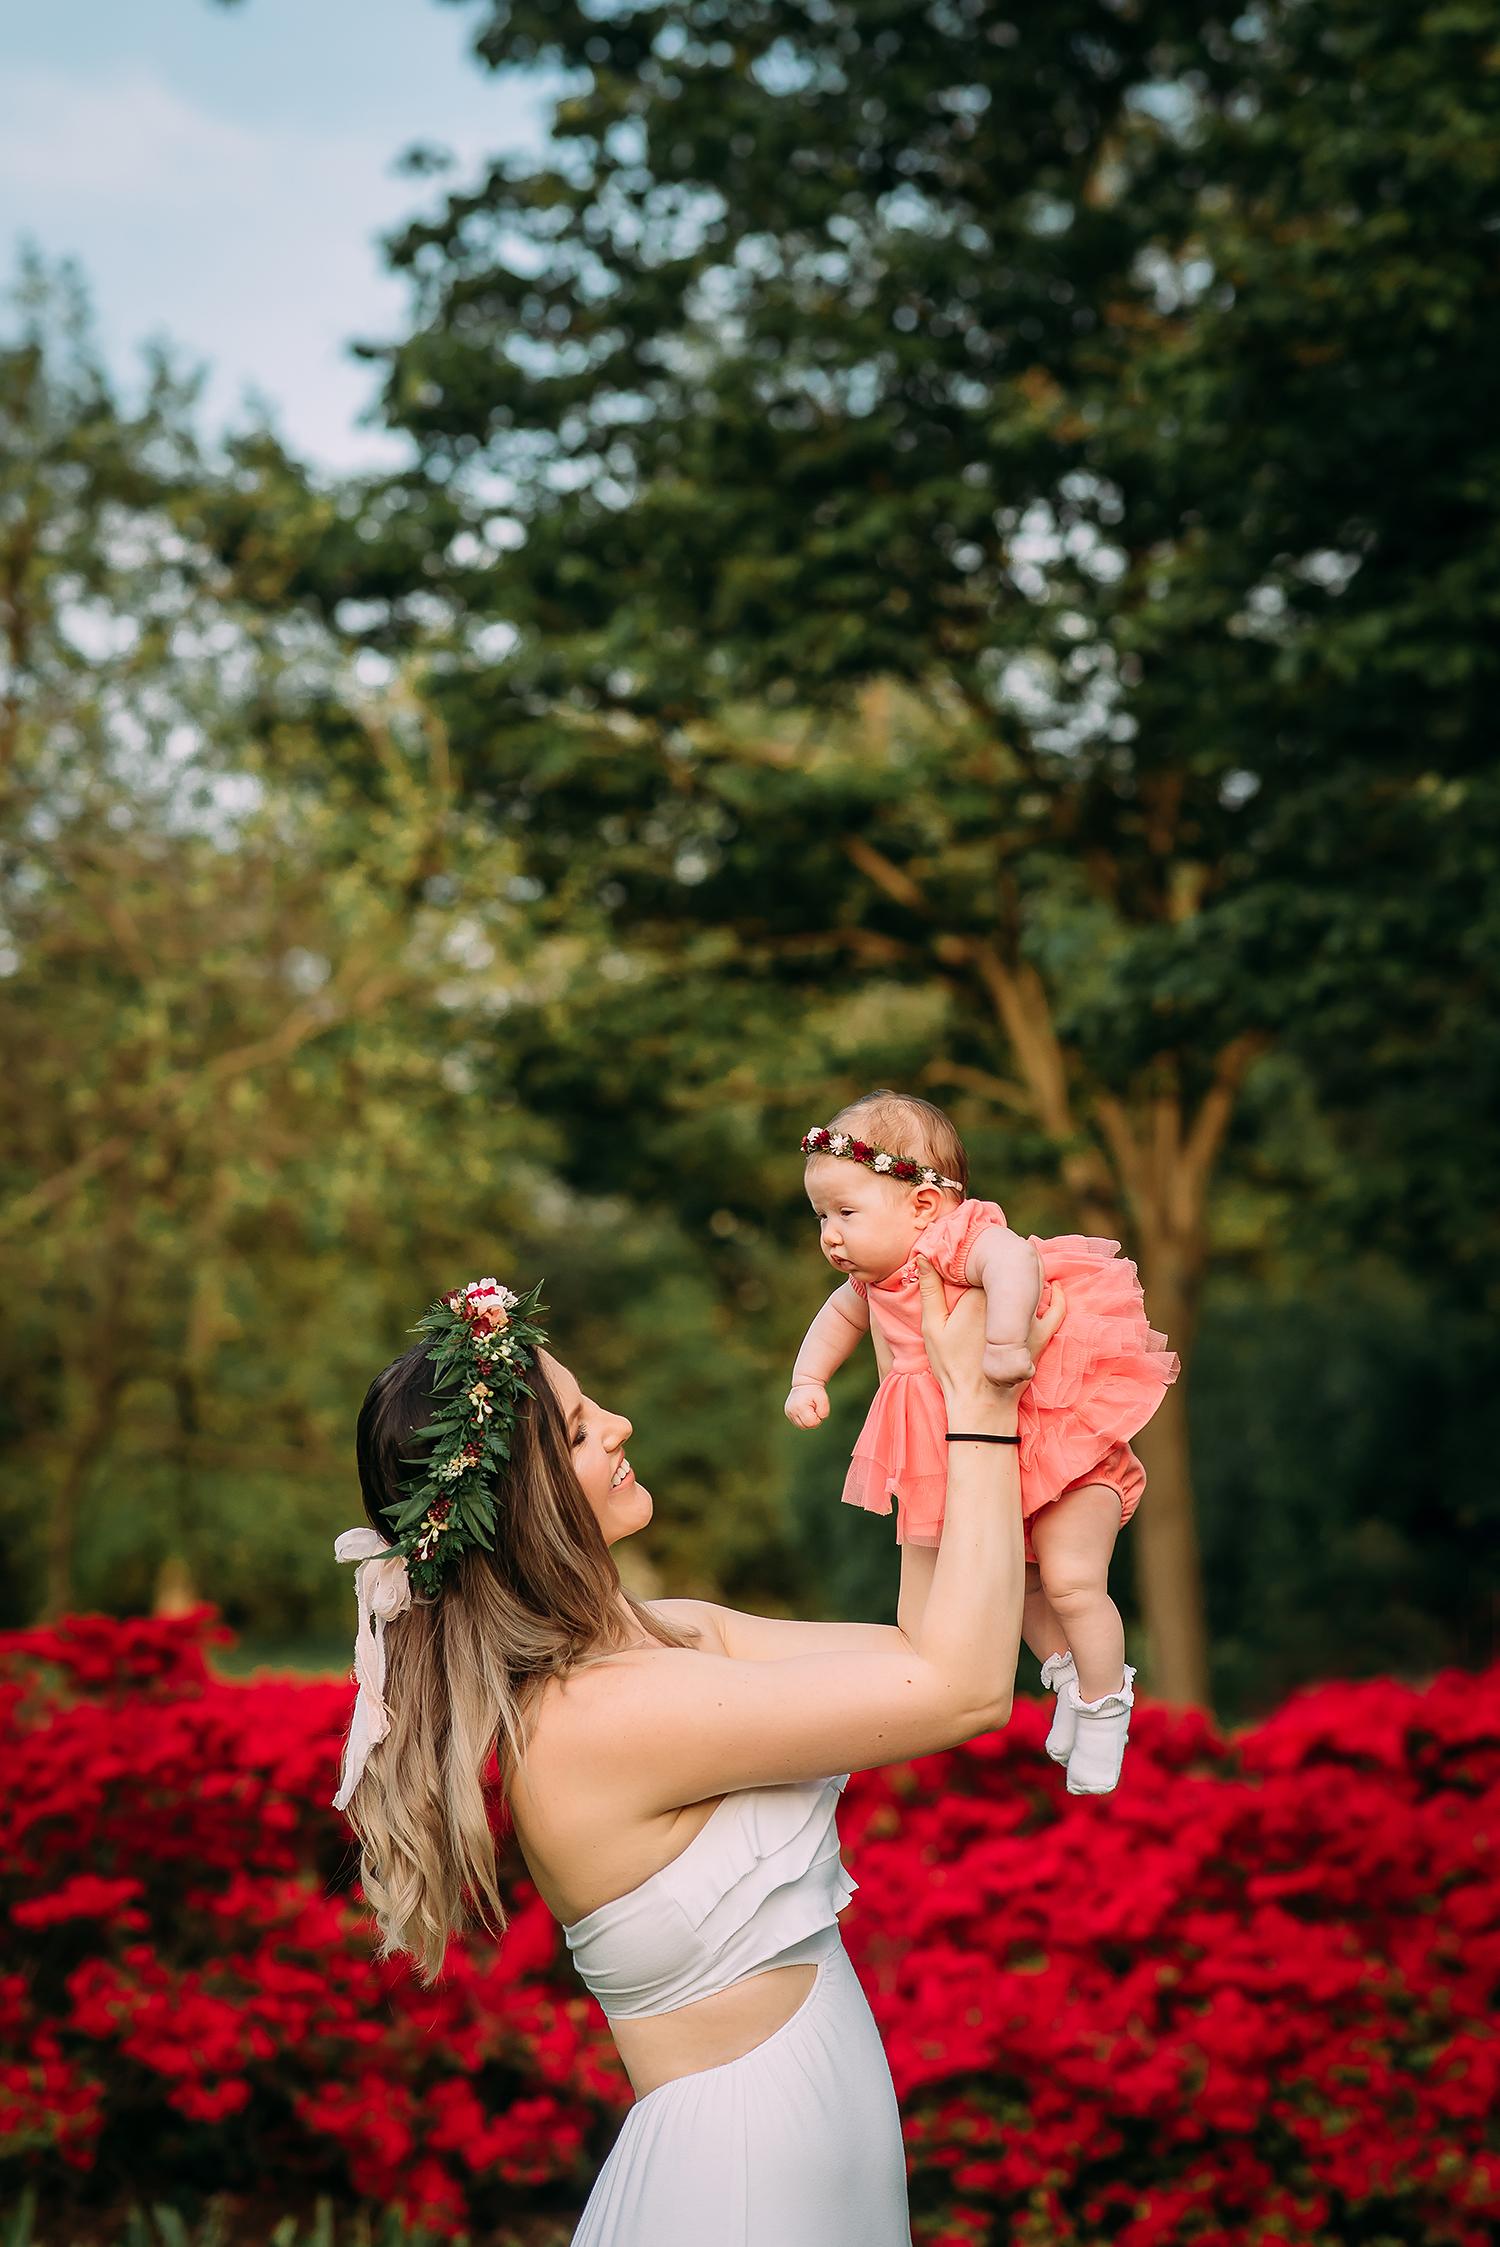 Jessica Fenfert Photography Baltimore Maryland Family Photographer (7).jpg